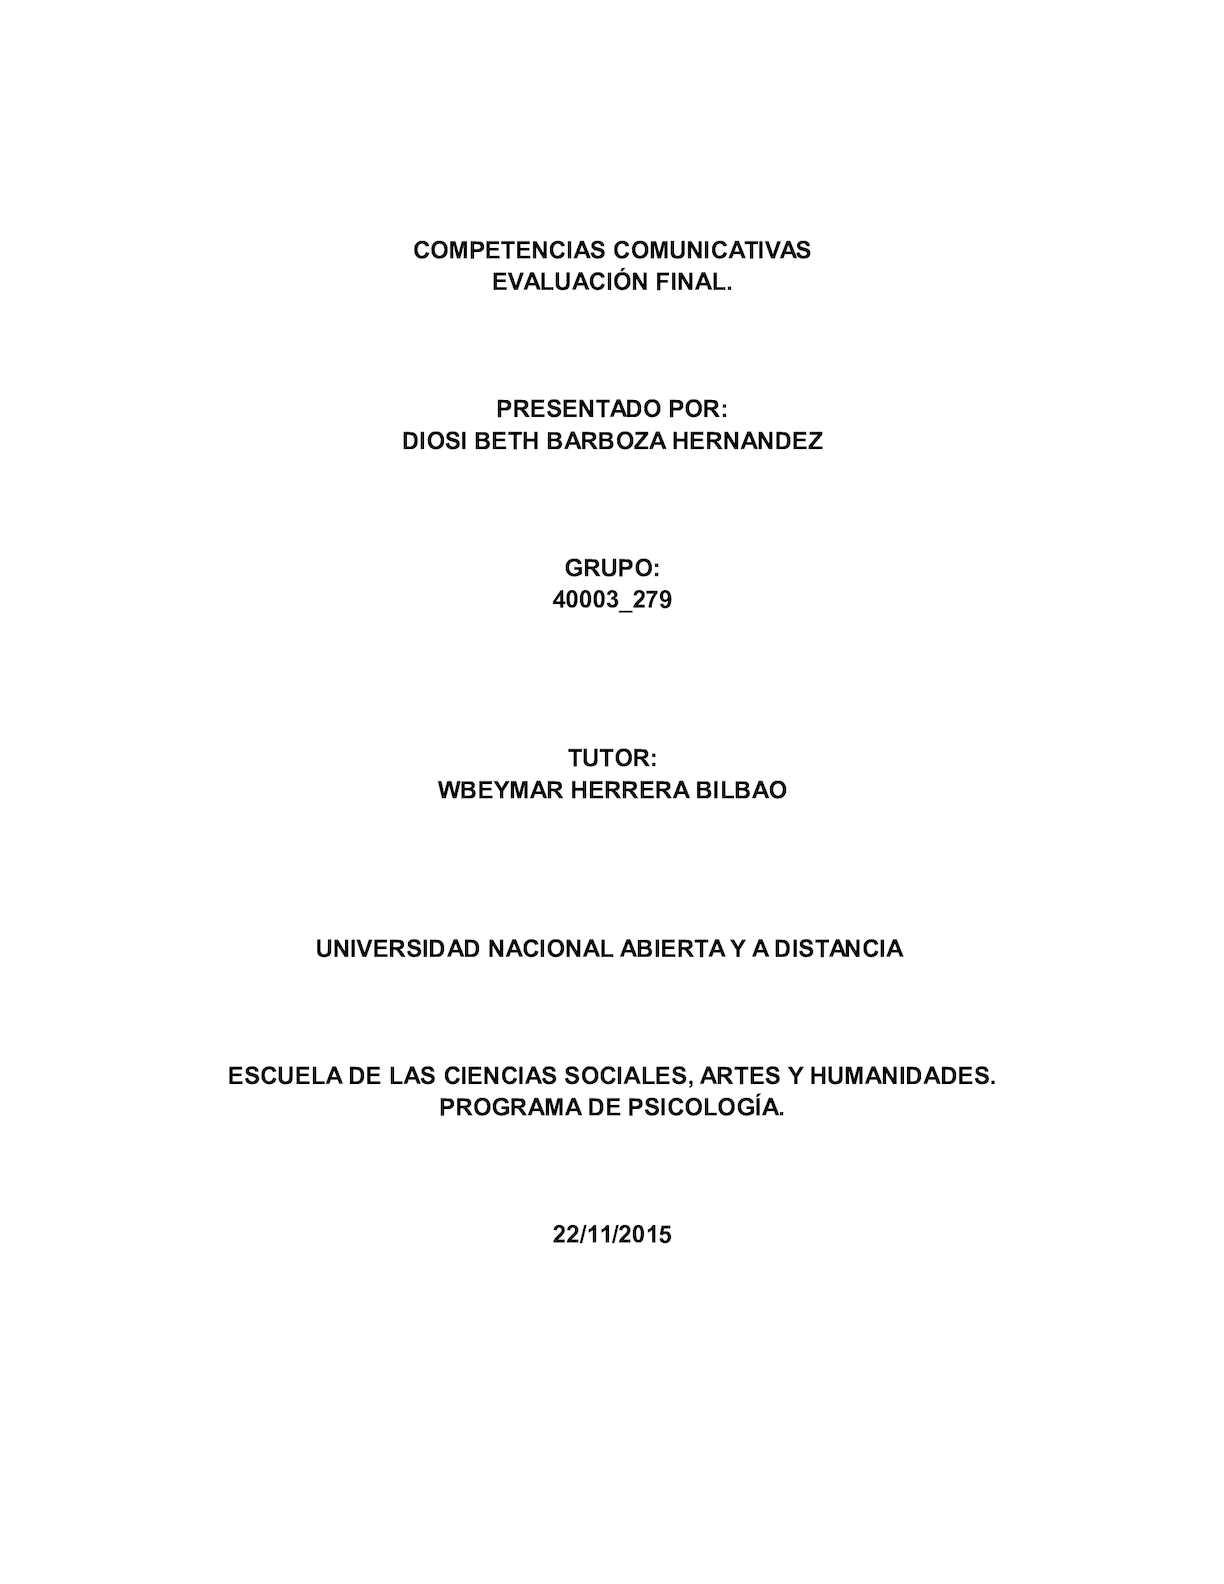 Evaluacion Final Competencias Comunicativas